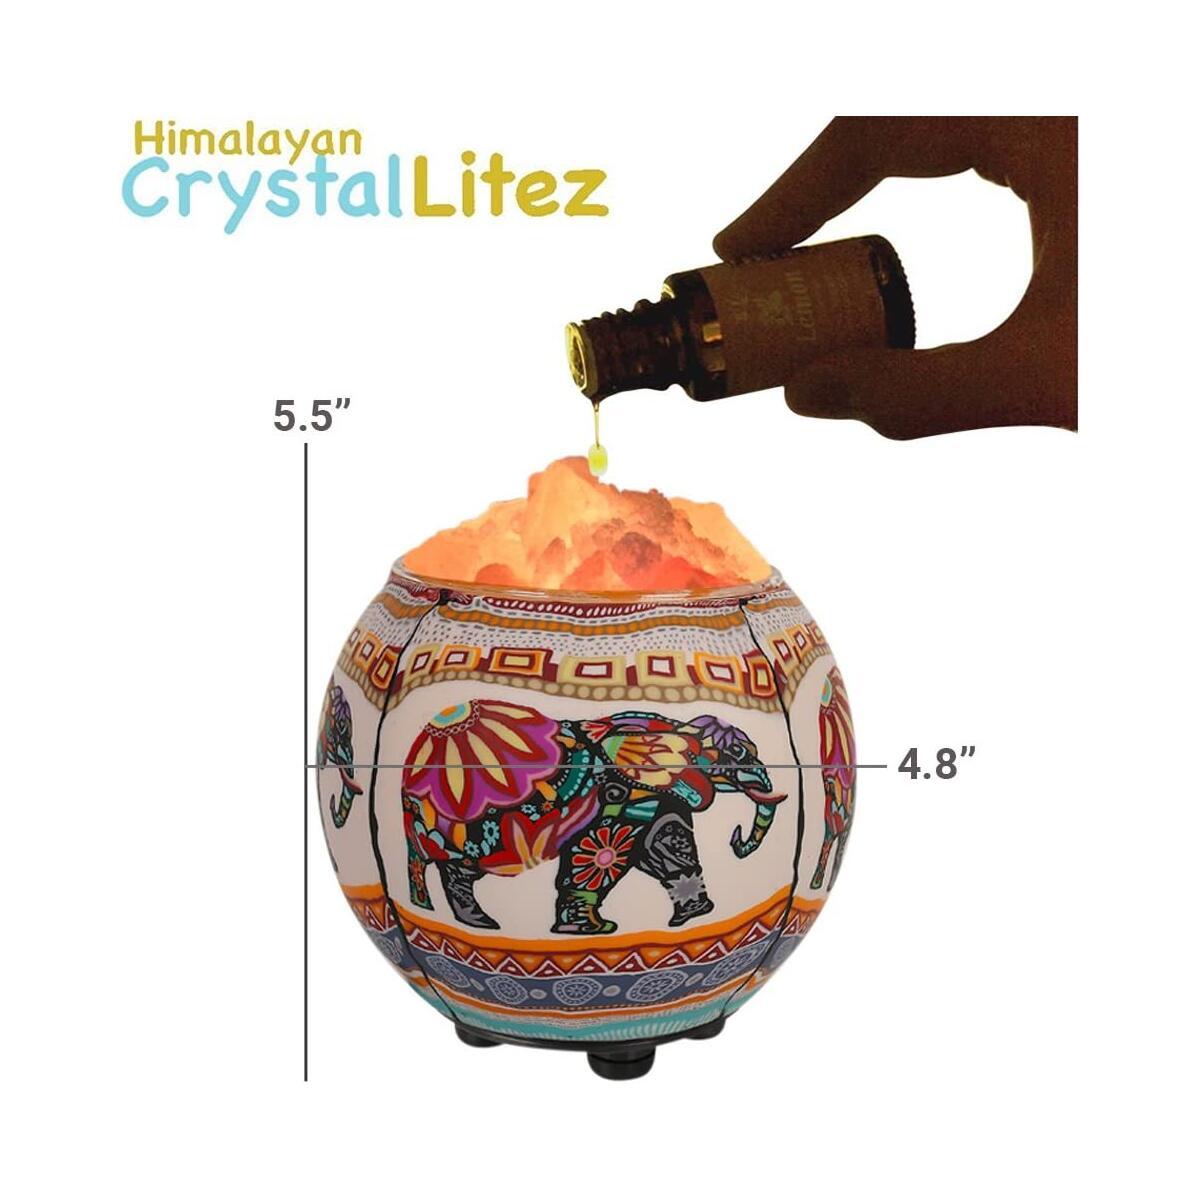 Himalayan CrystalLitez Himalayan Salt Lamp with UL Listed Dimmer Cord, Original Salt Crystals in A Handcrafted Artisan Bowl, Aromatherapy Salt Lamp(Ethnic Elephant)